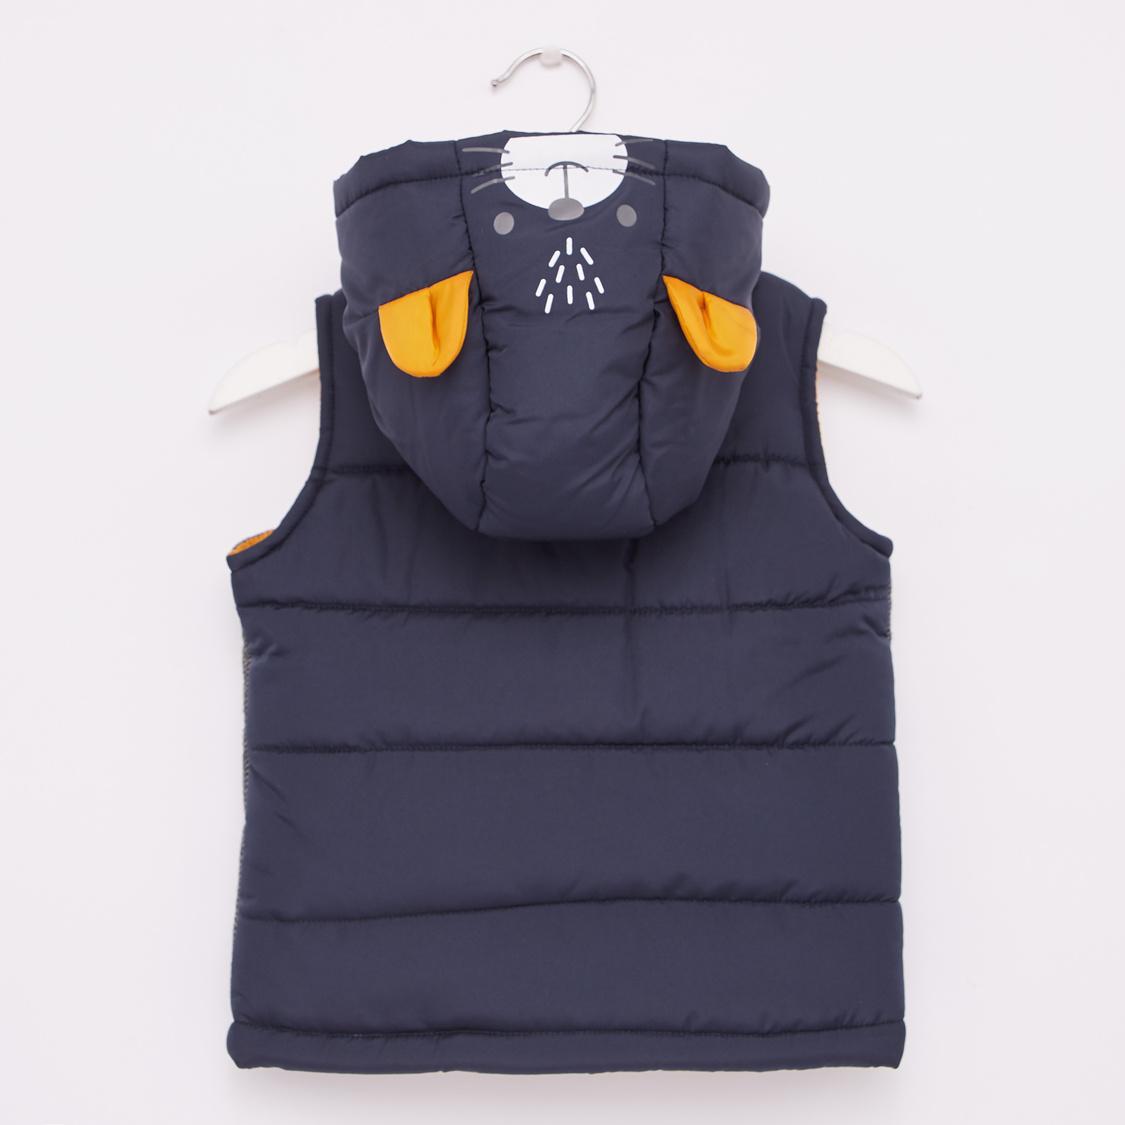 Textured Gilet Jacket with Animal Print Hood and Zip Closure